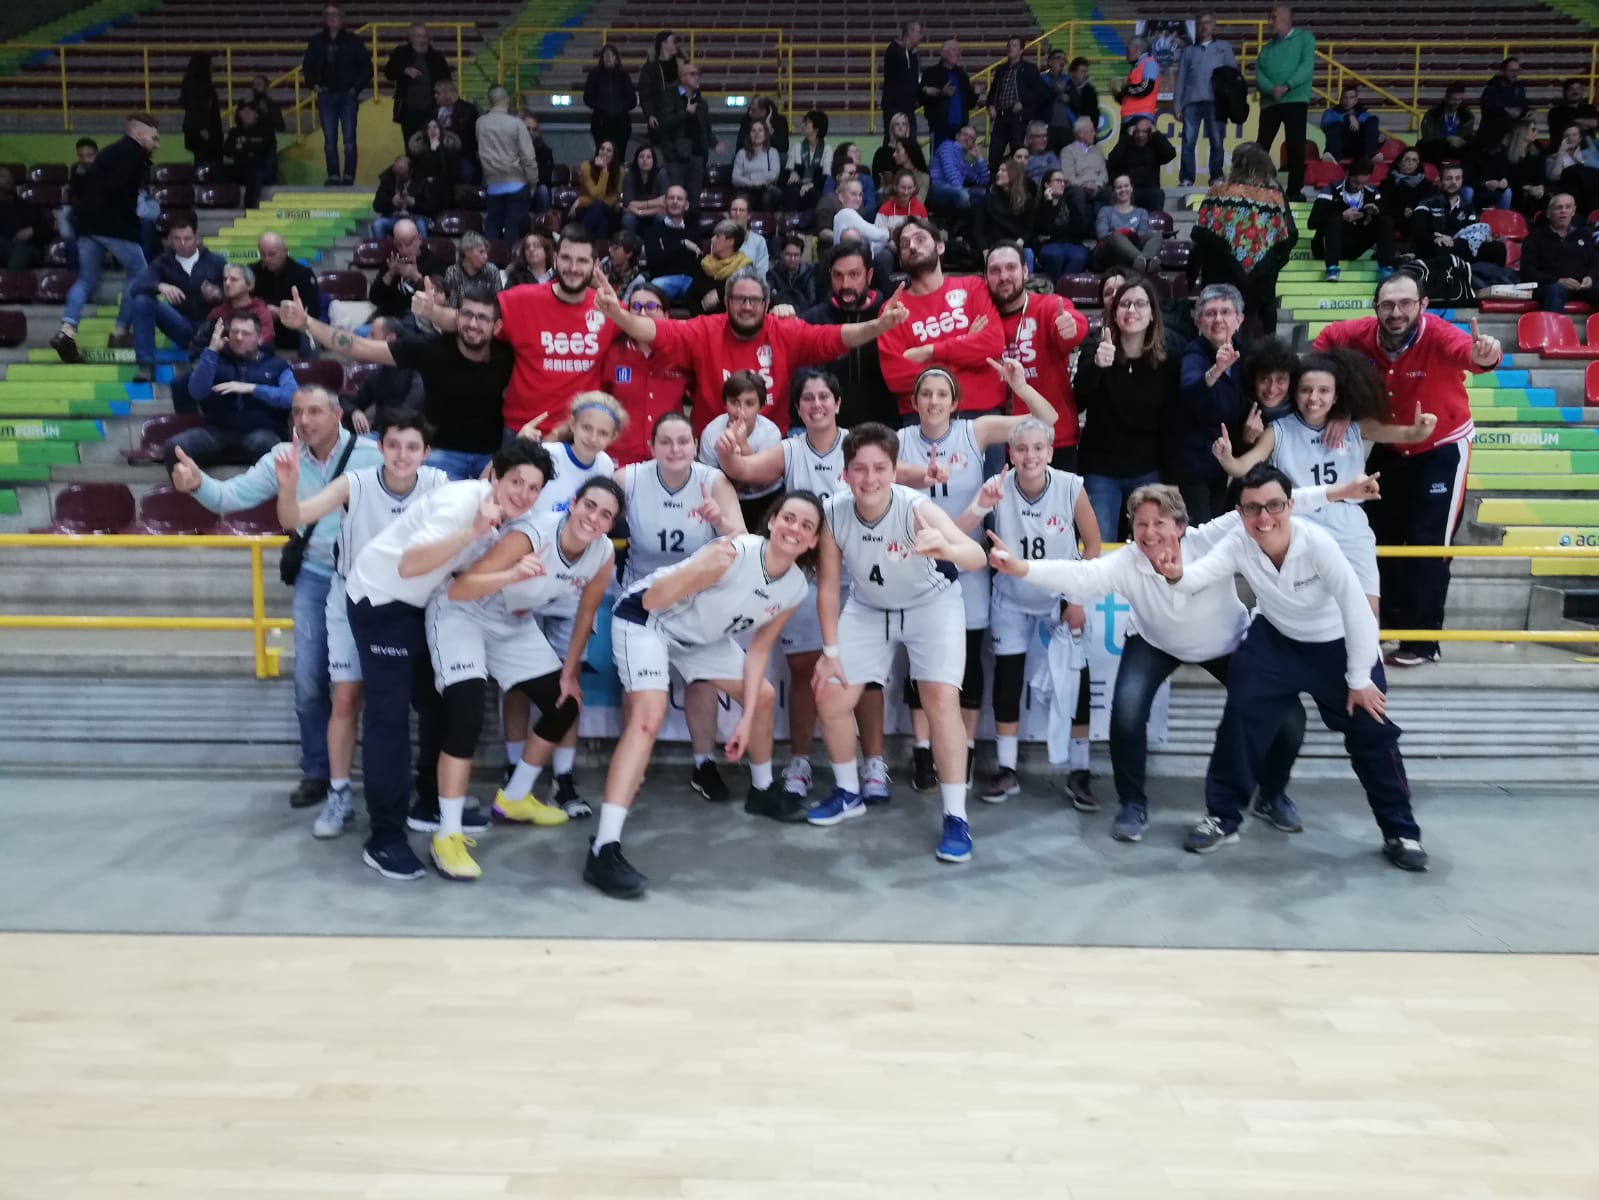 Ragazze d'oro: l'ASD Sordi Pesaro si laurea Campione d'Europa a Verona